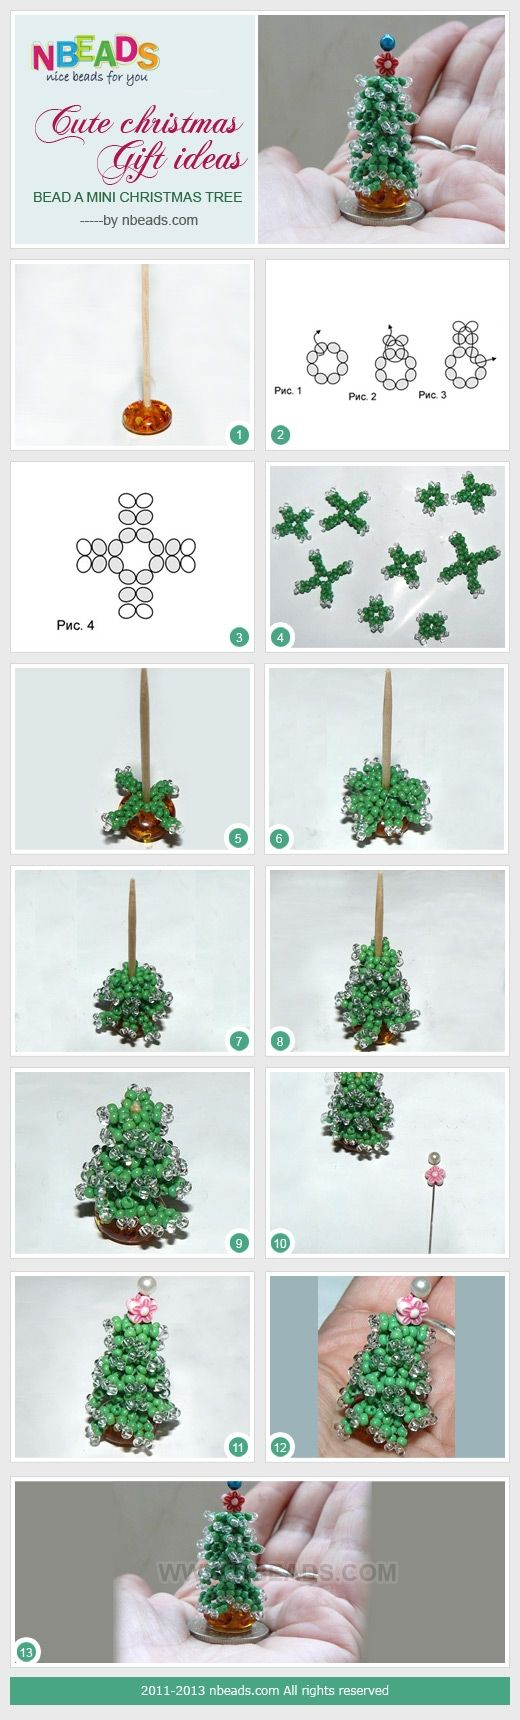 Cute Christmas Gift Ideas - Bead A Mini Christmas Tree – Nbeads